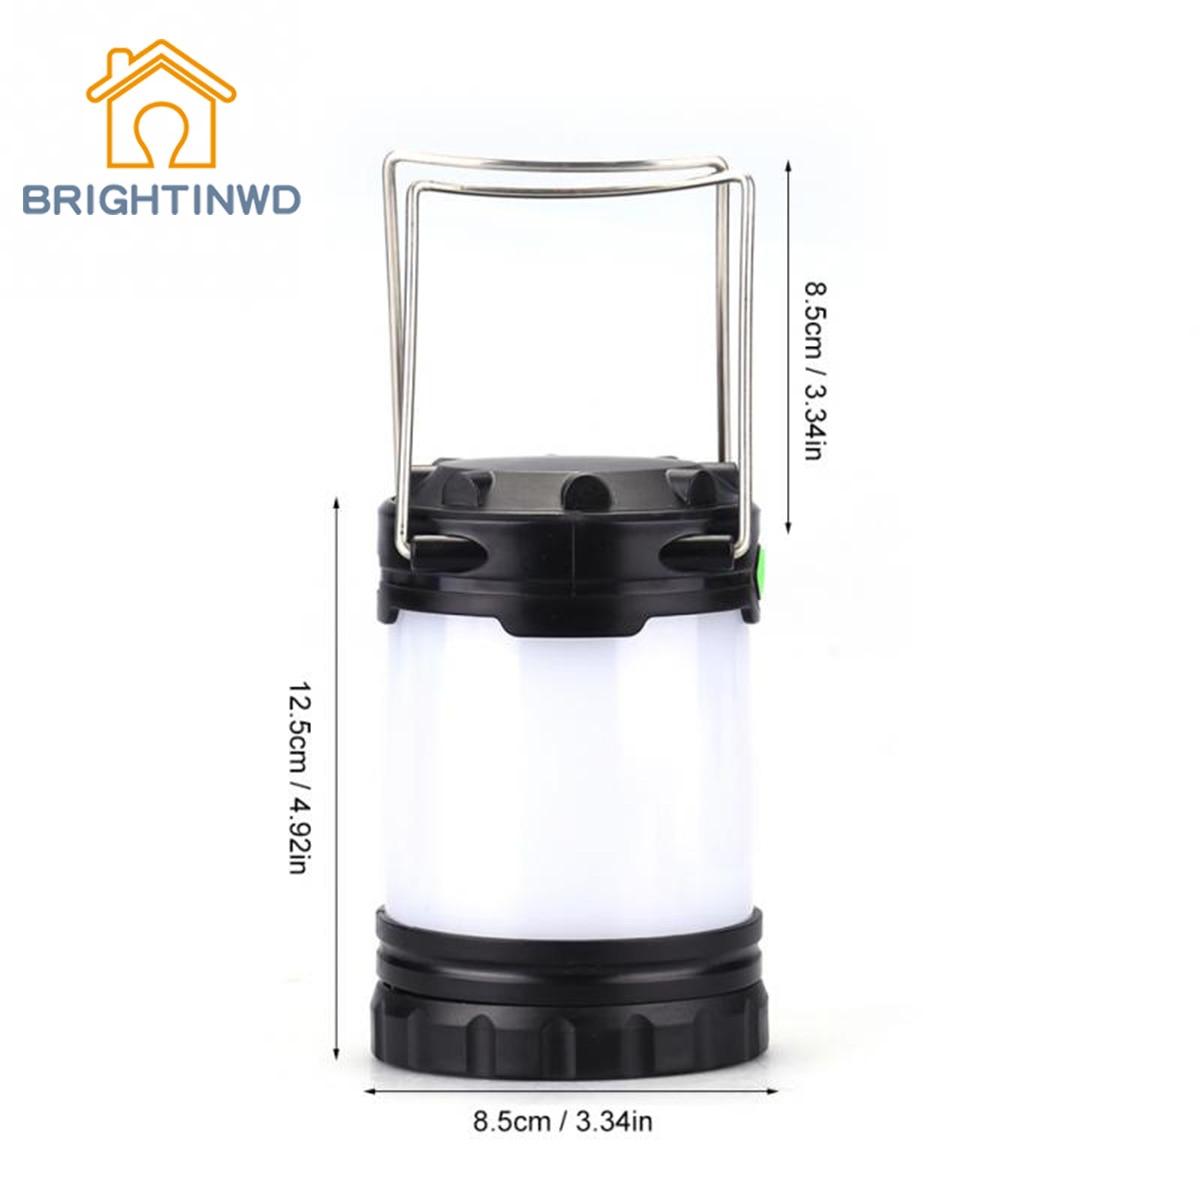 Portable Lantern Tent light Outdoor LED Camping Lantern Collapsible Lightweight Lighting Camping Lamp For Hiking Tent Lanterns